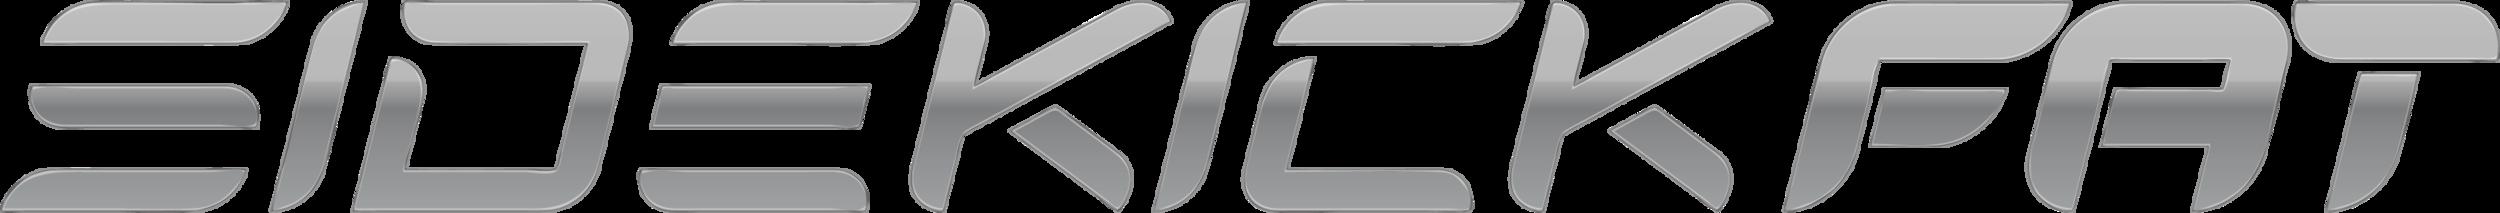 sidekick fat logo.png